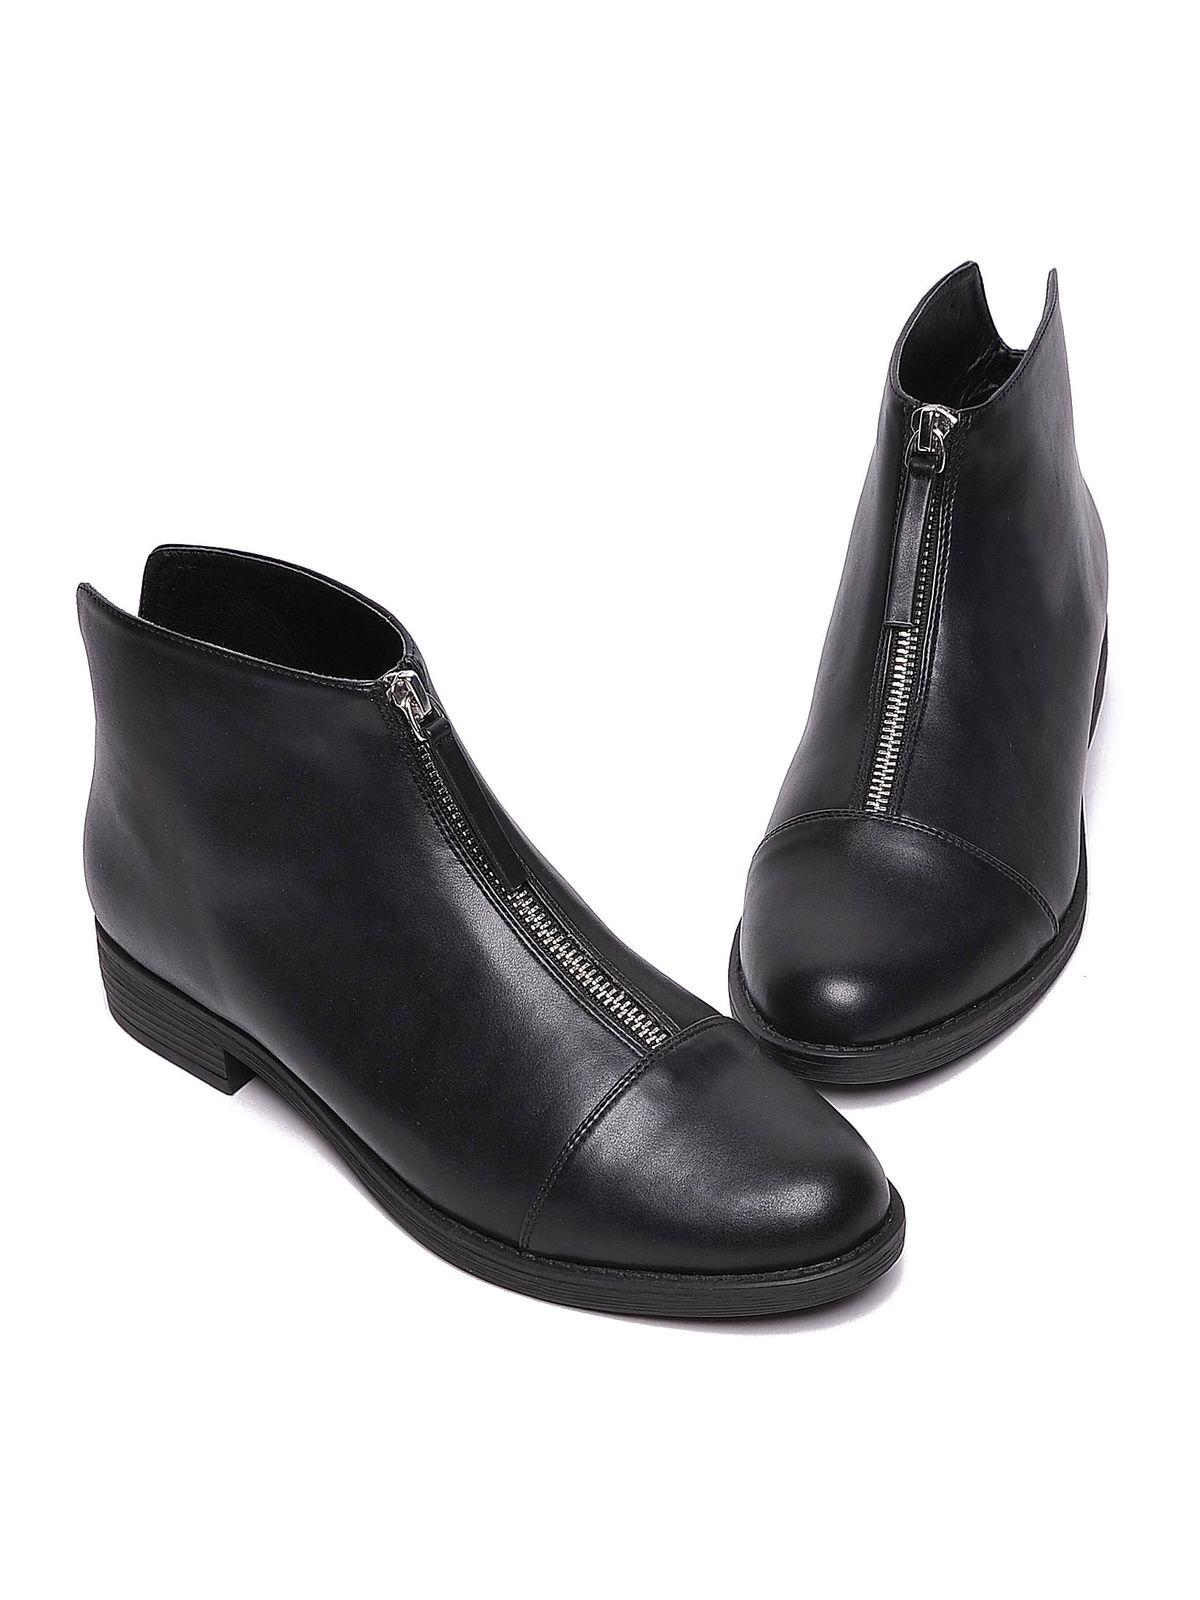 b23a7ff0f2e top-secret-black-ankle-boots-casual-low-heel-zippe-S033662-1-330572.jpg